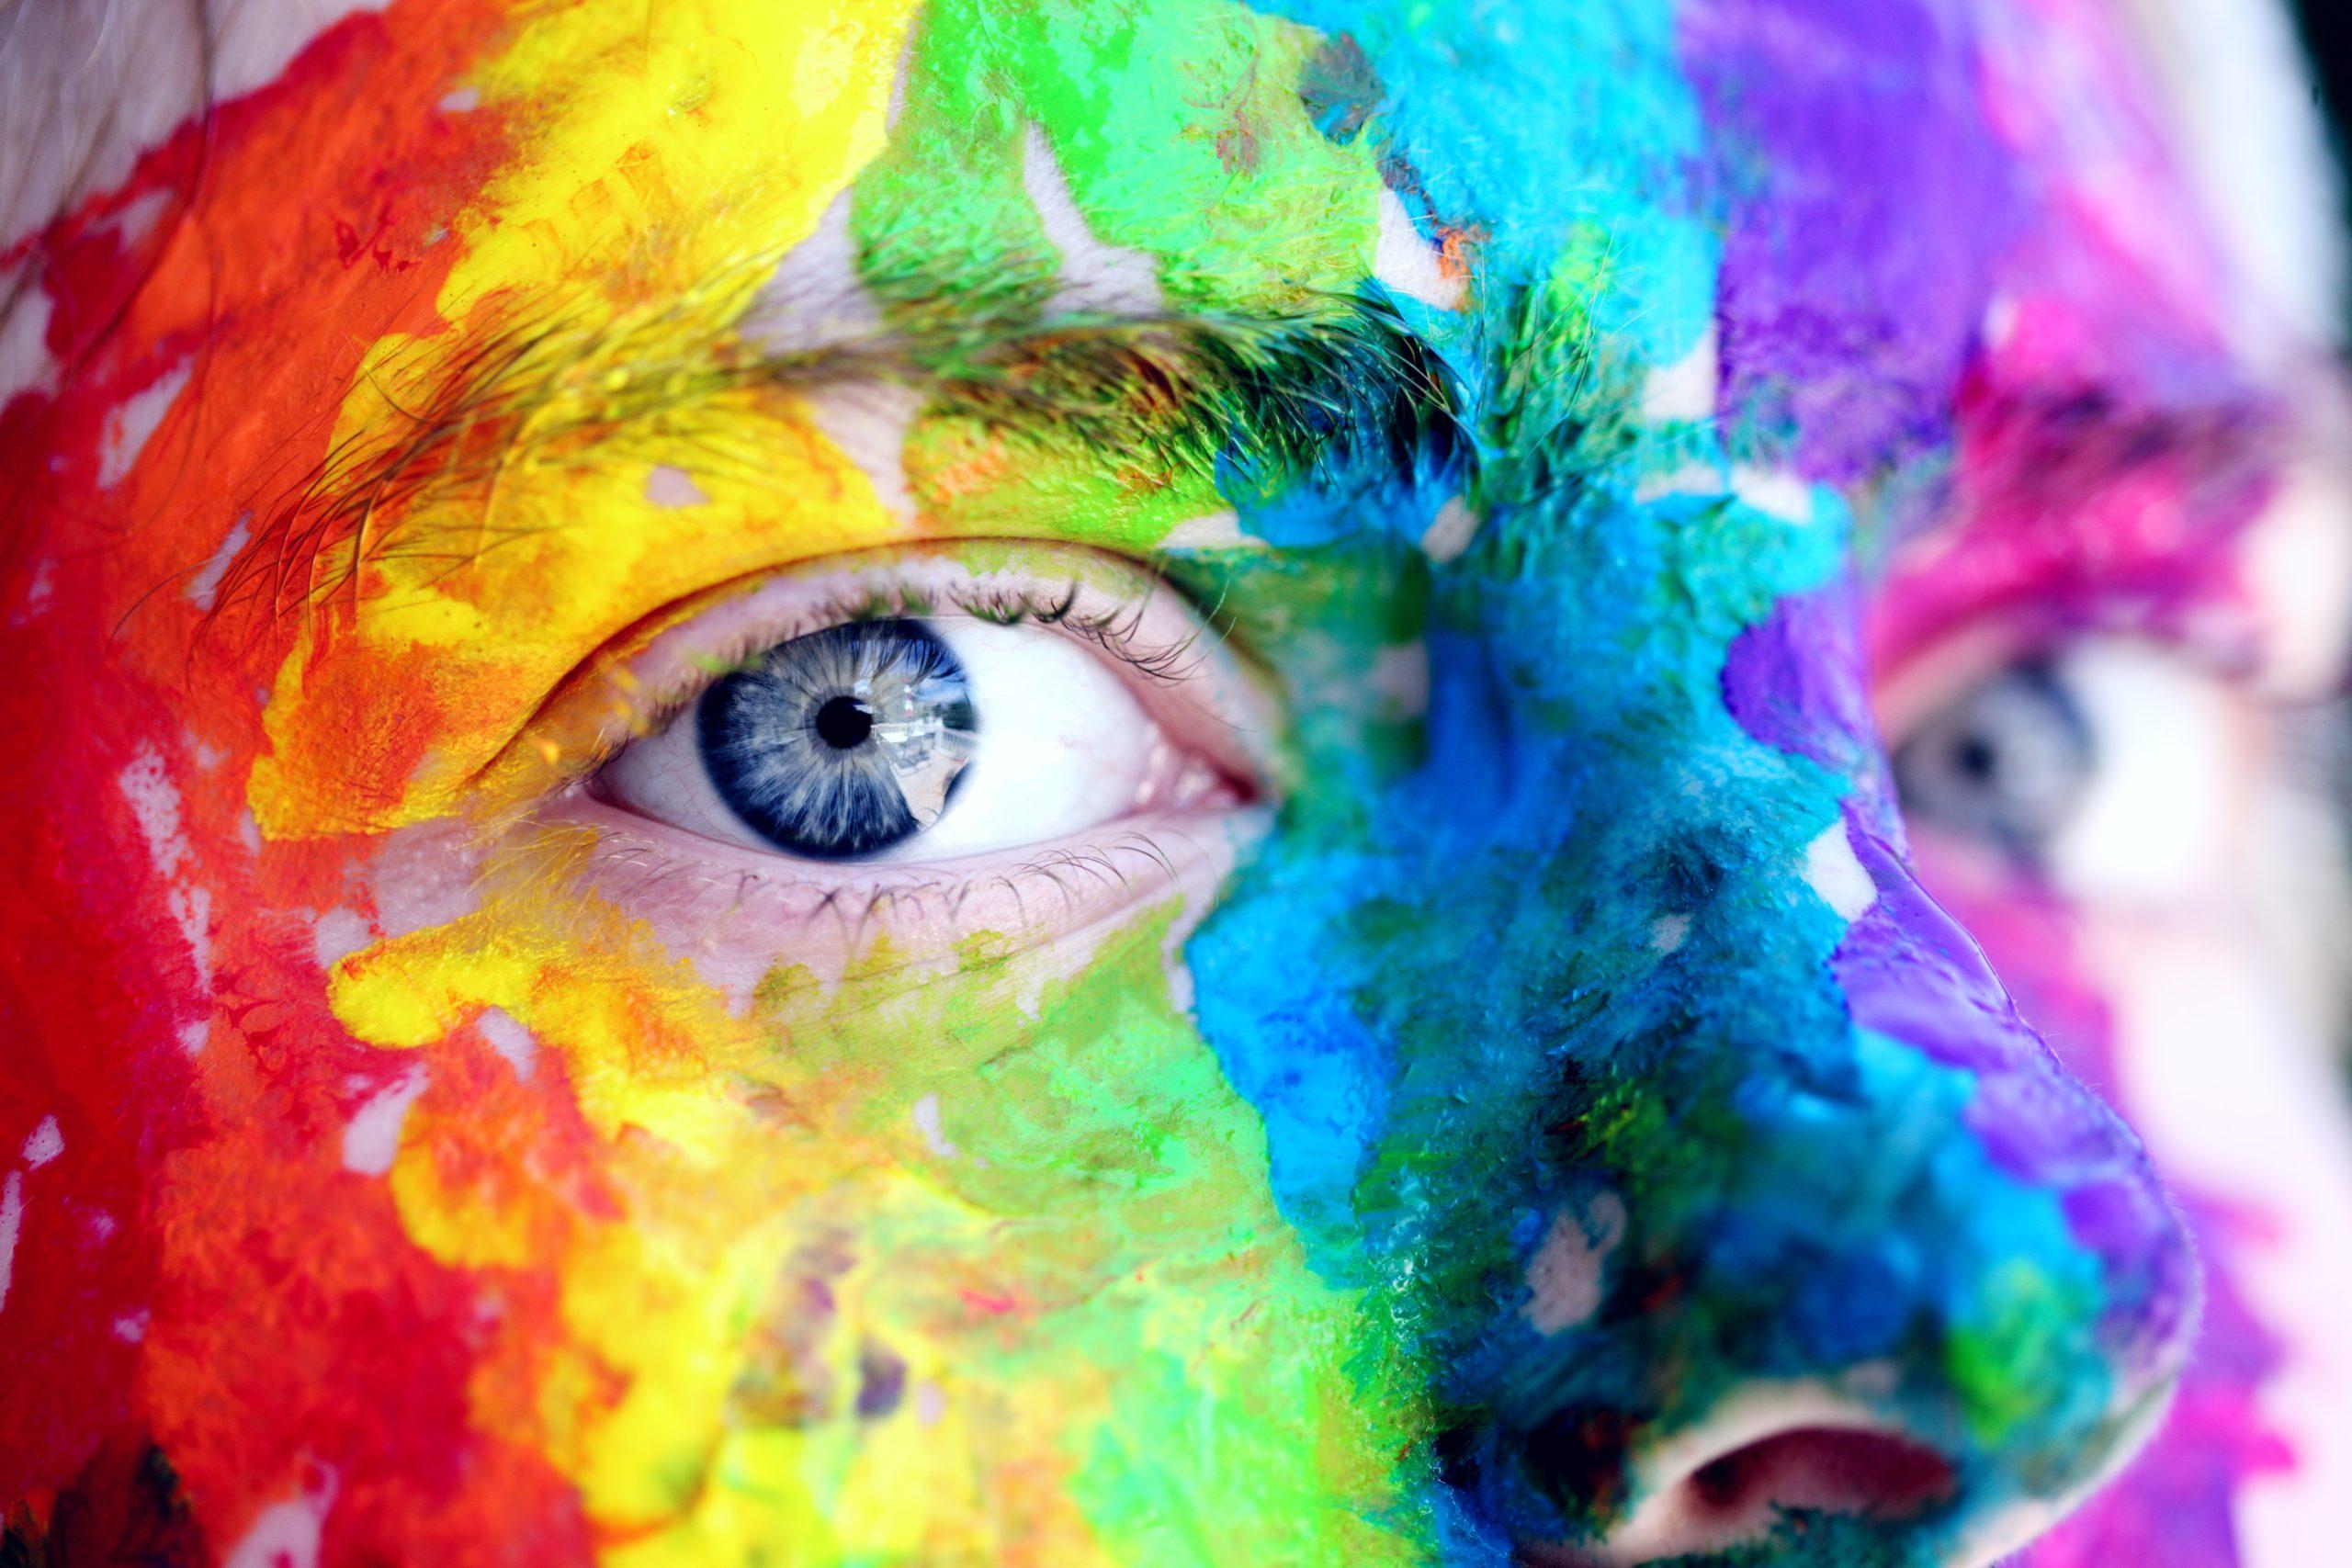 Self-Esteem: How do I feel about who I am?